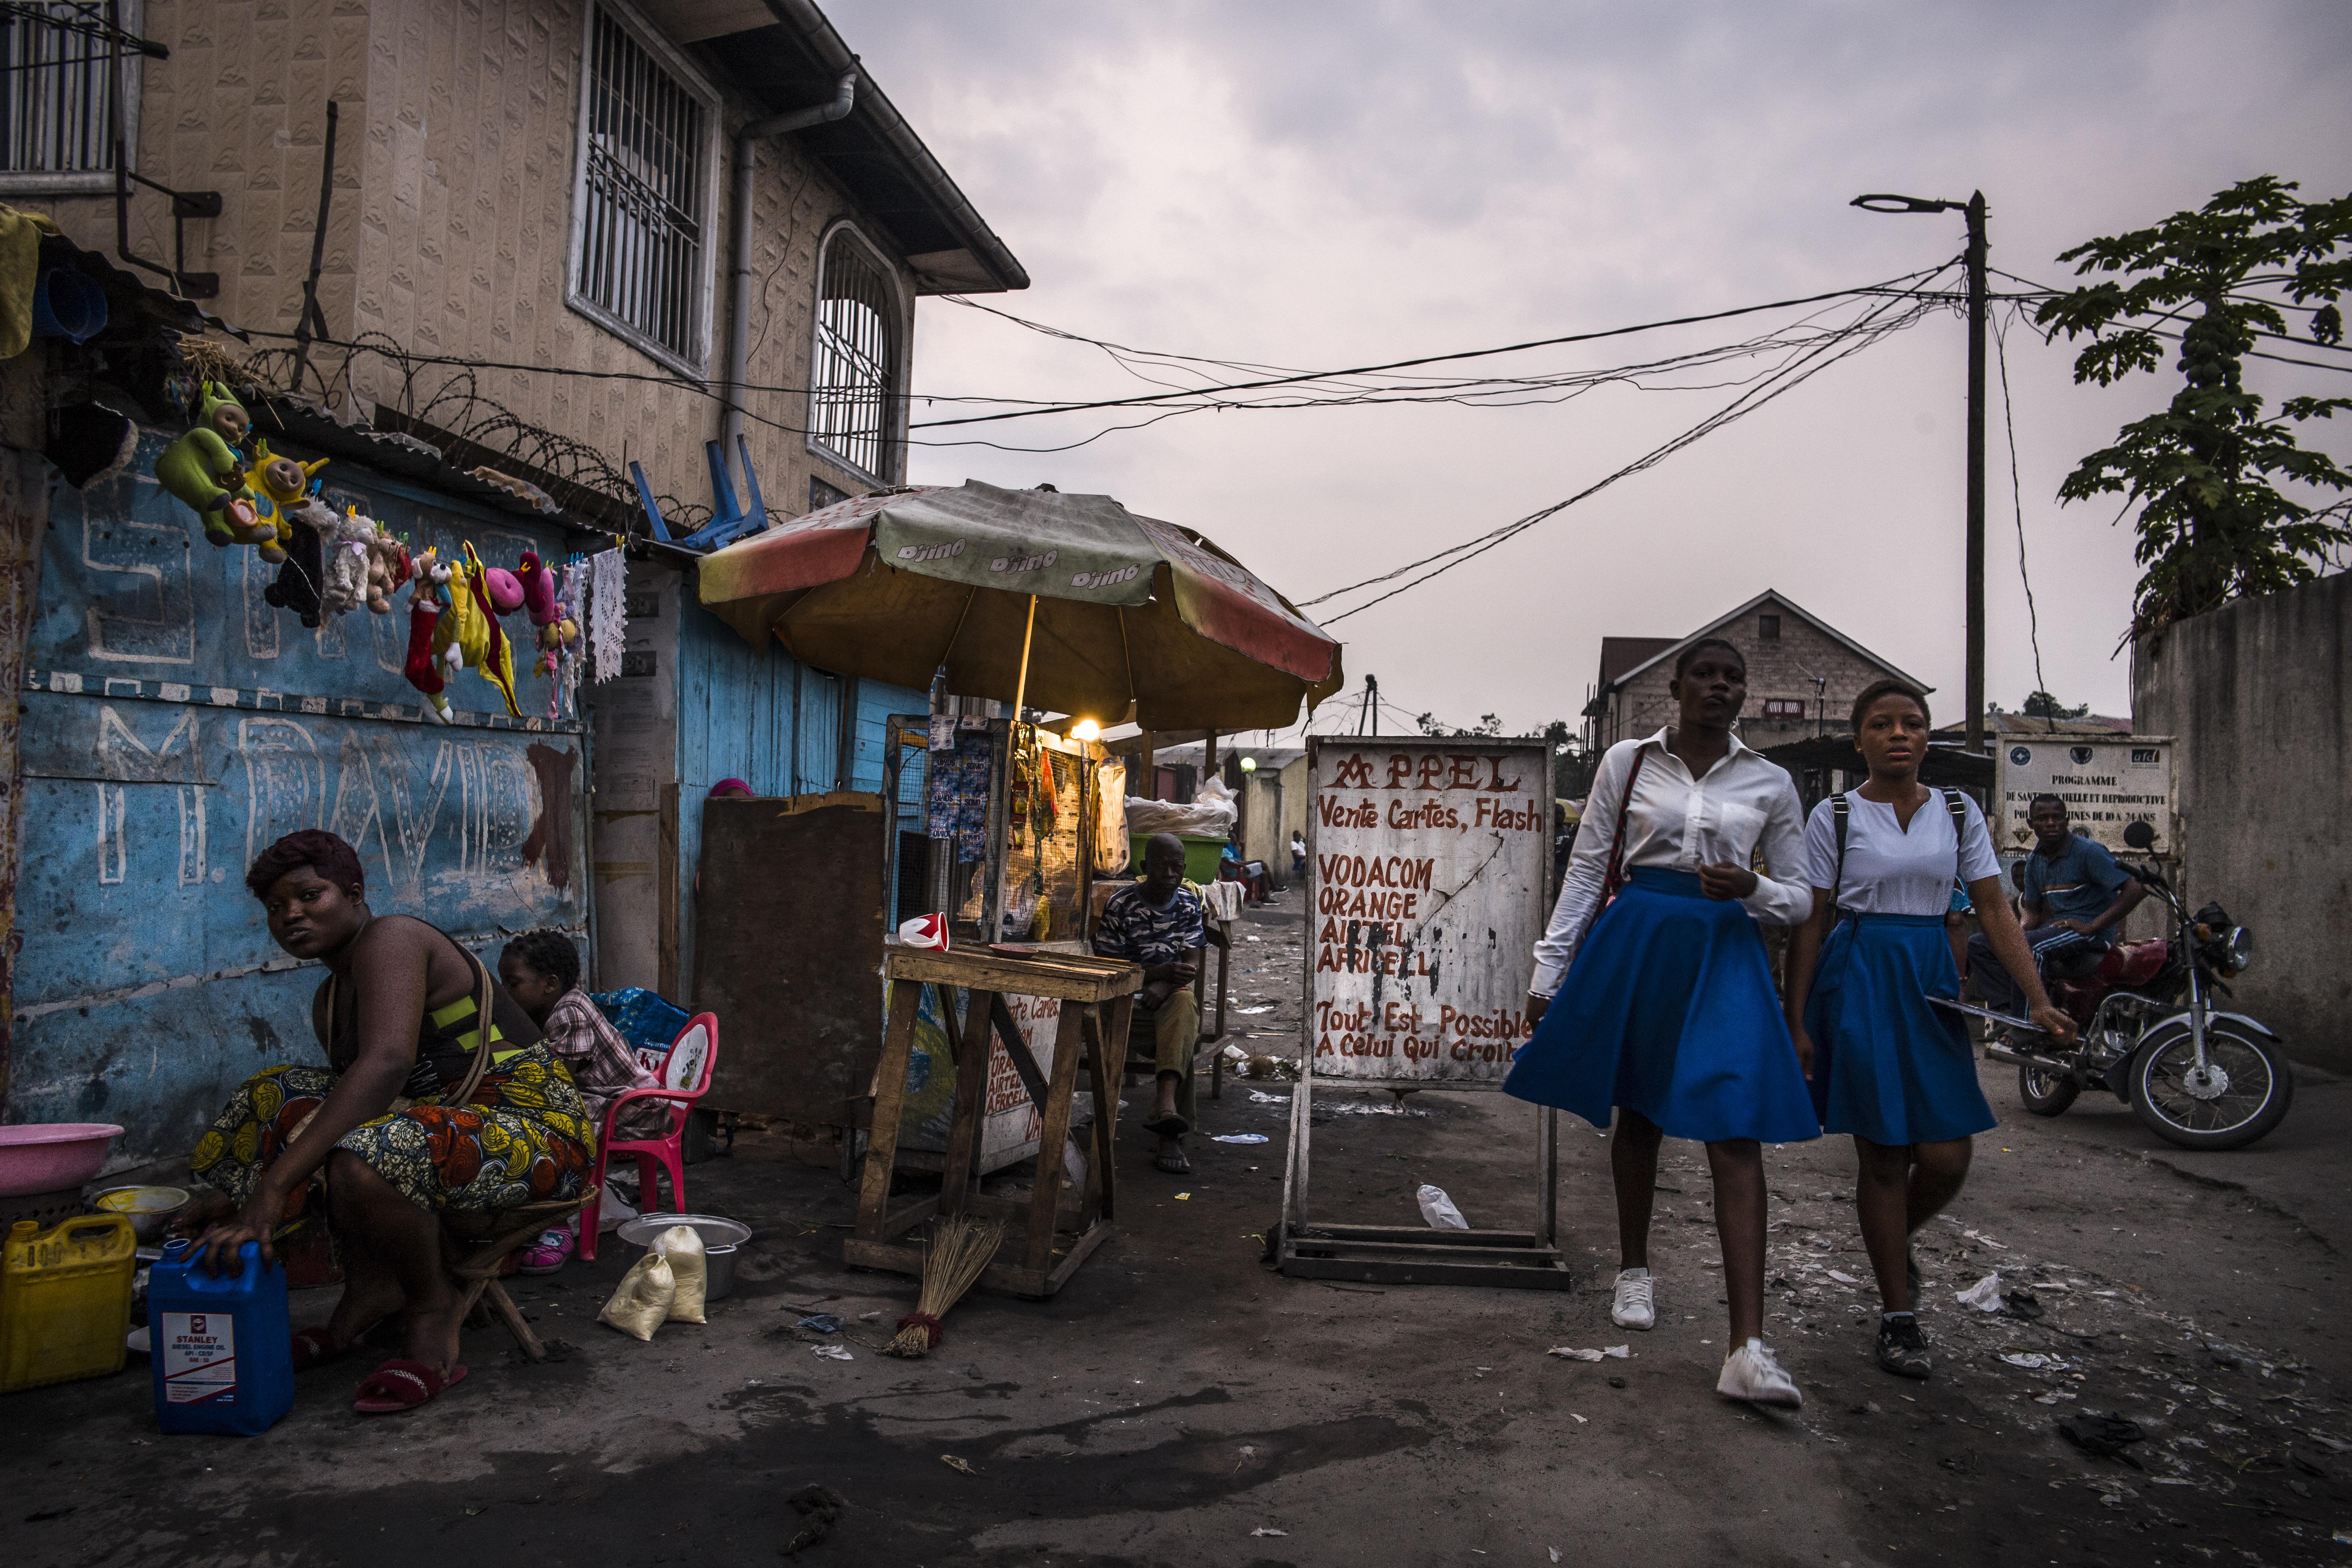 Straßenszene in Kinshasa. Foto: Olivier Papegenies